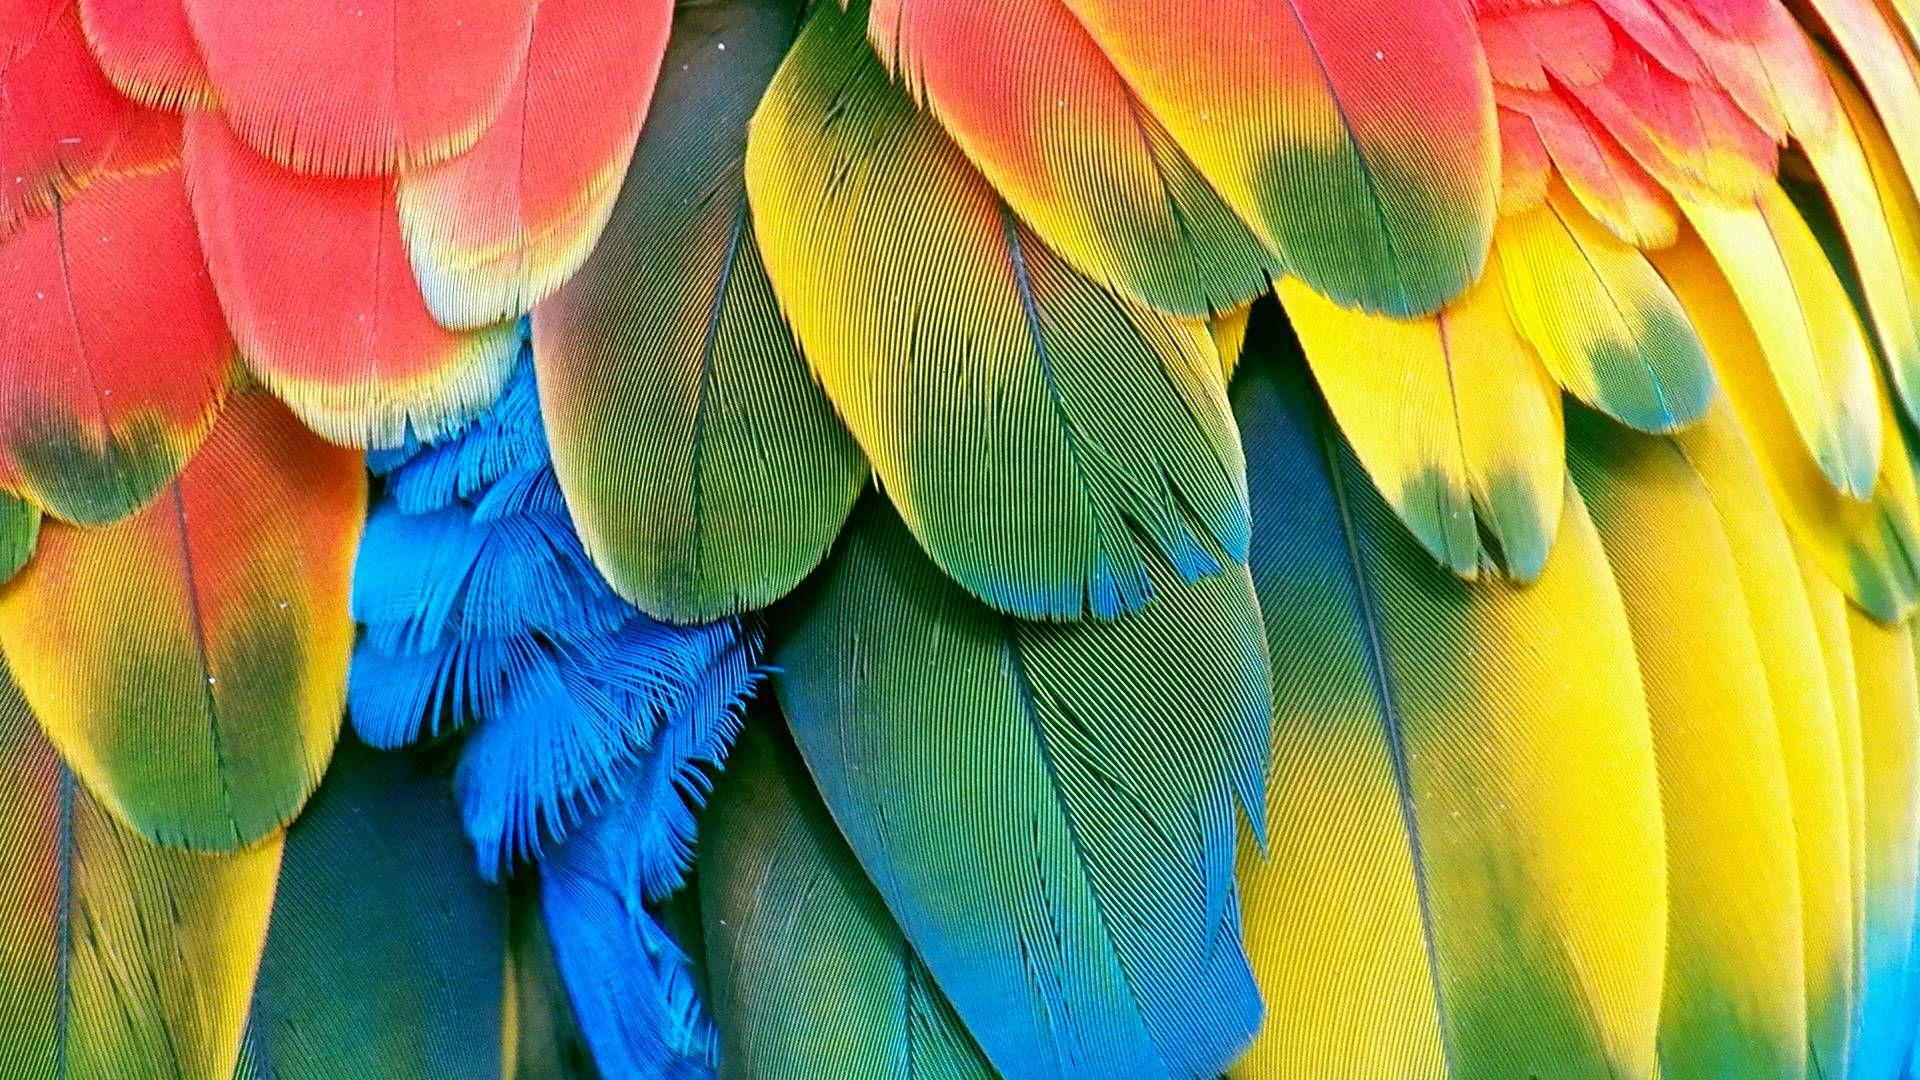 Parrots HD desktop wallpaper High Definition Fullscreen Mobile